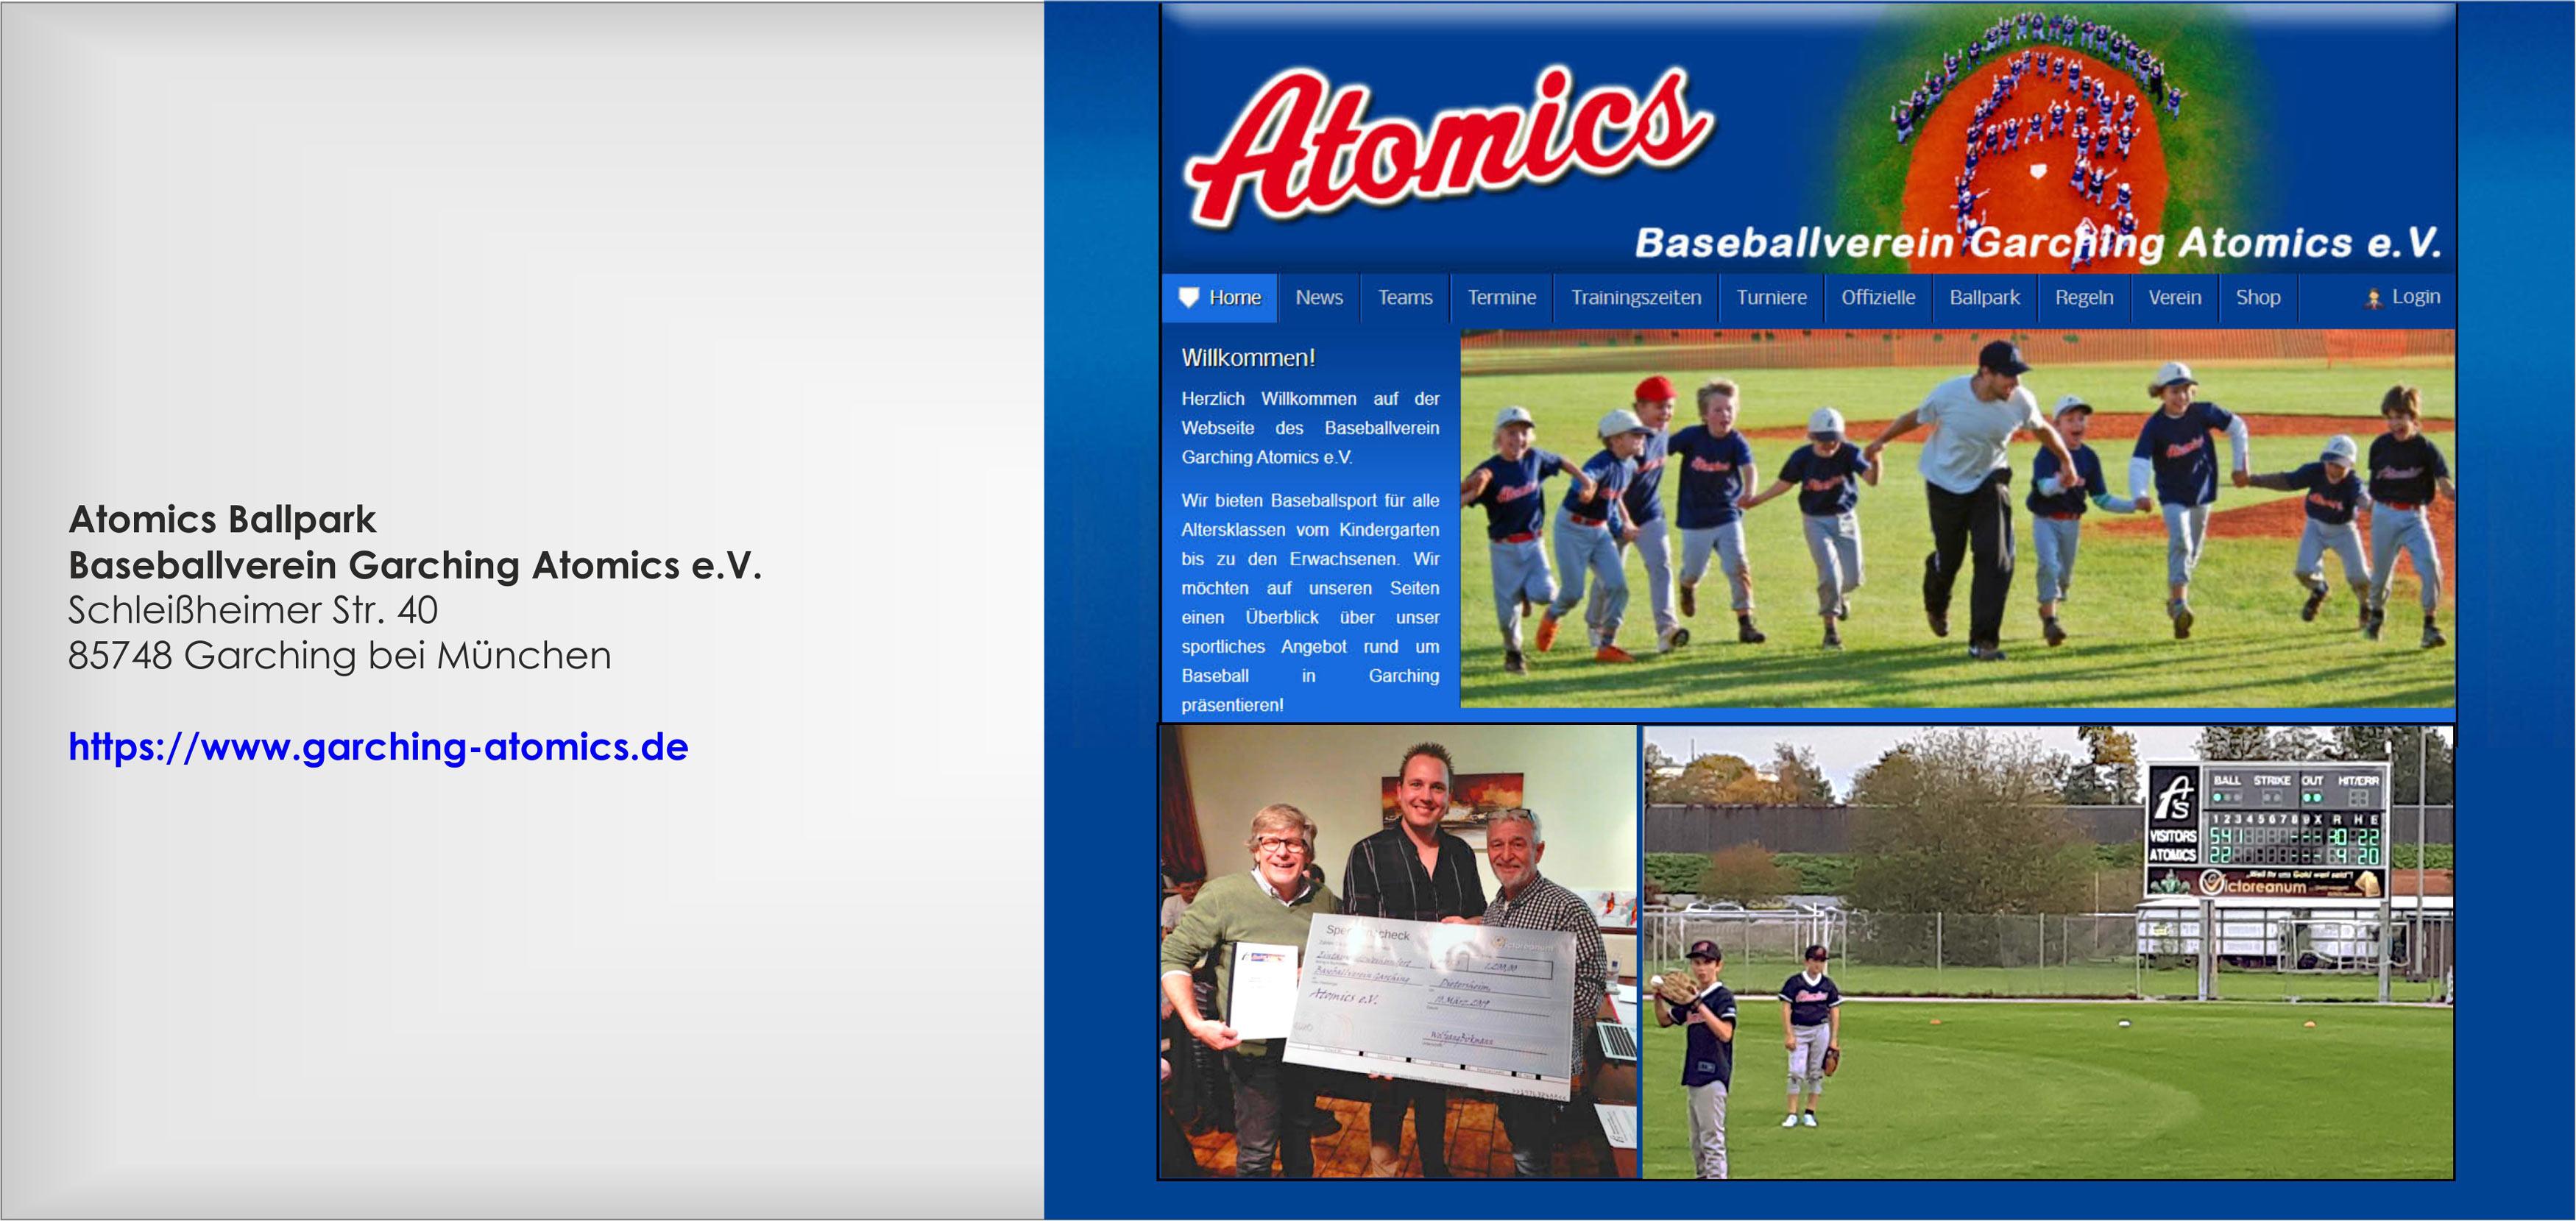 Baseball Garchinger Atomics, Victoreanum-Sponsoring, Soziales Engagement, Wolfgang Birkmann, Rein Warmels, Stefan Sauer